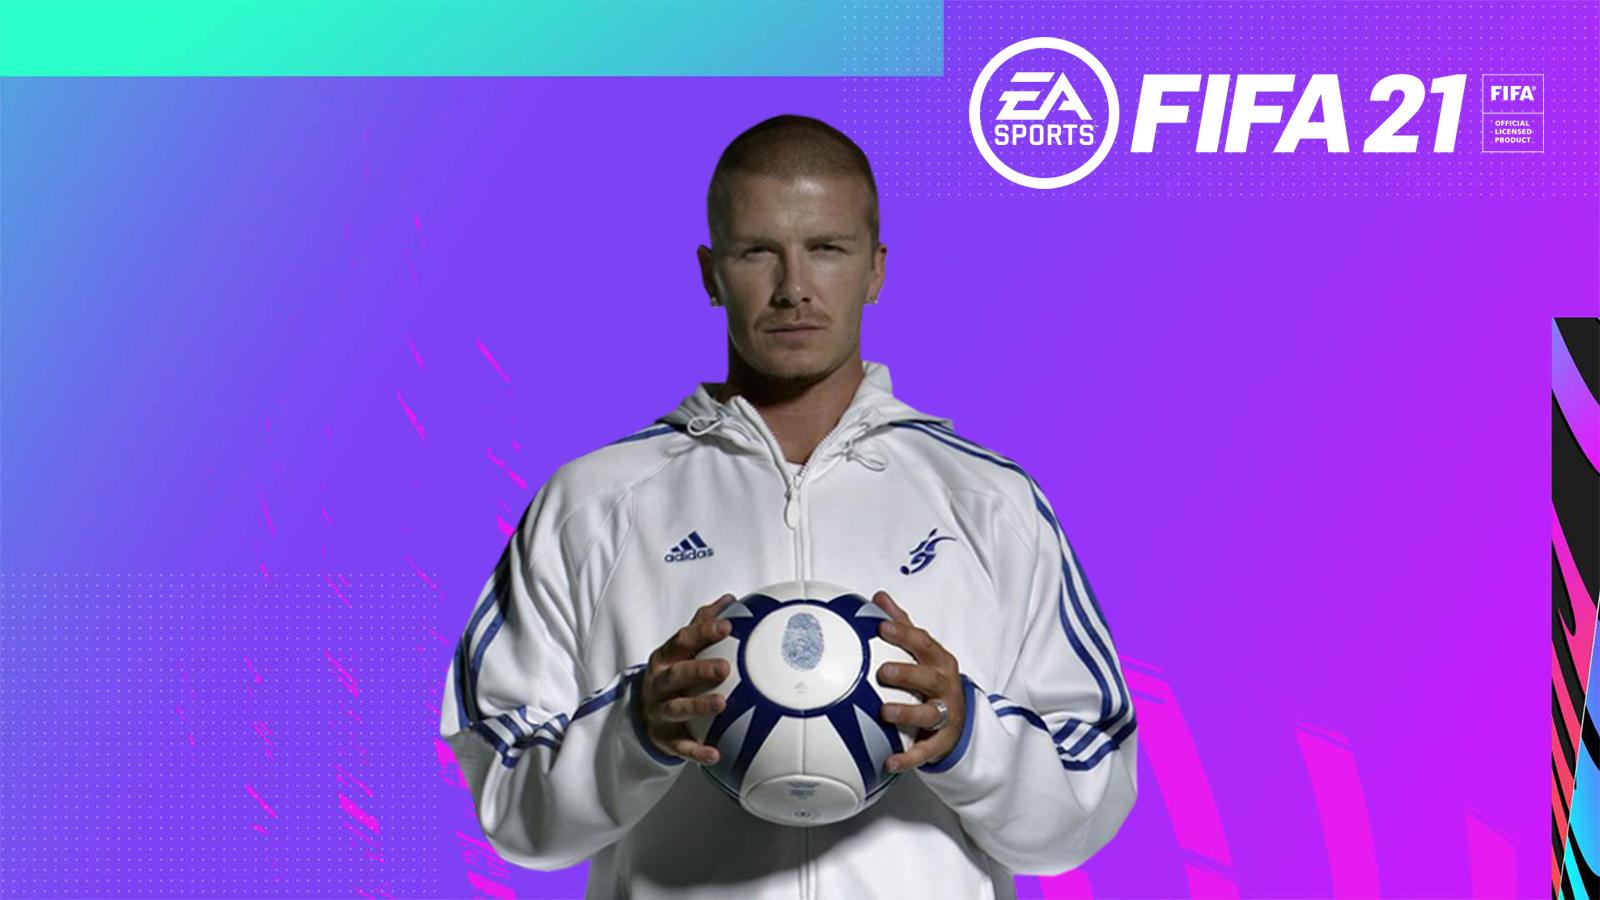 FIFA 21 Ultimate Team David Beckham Icon